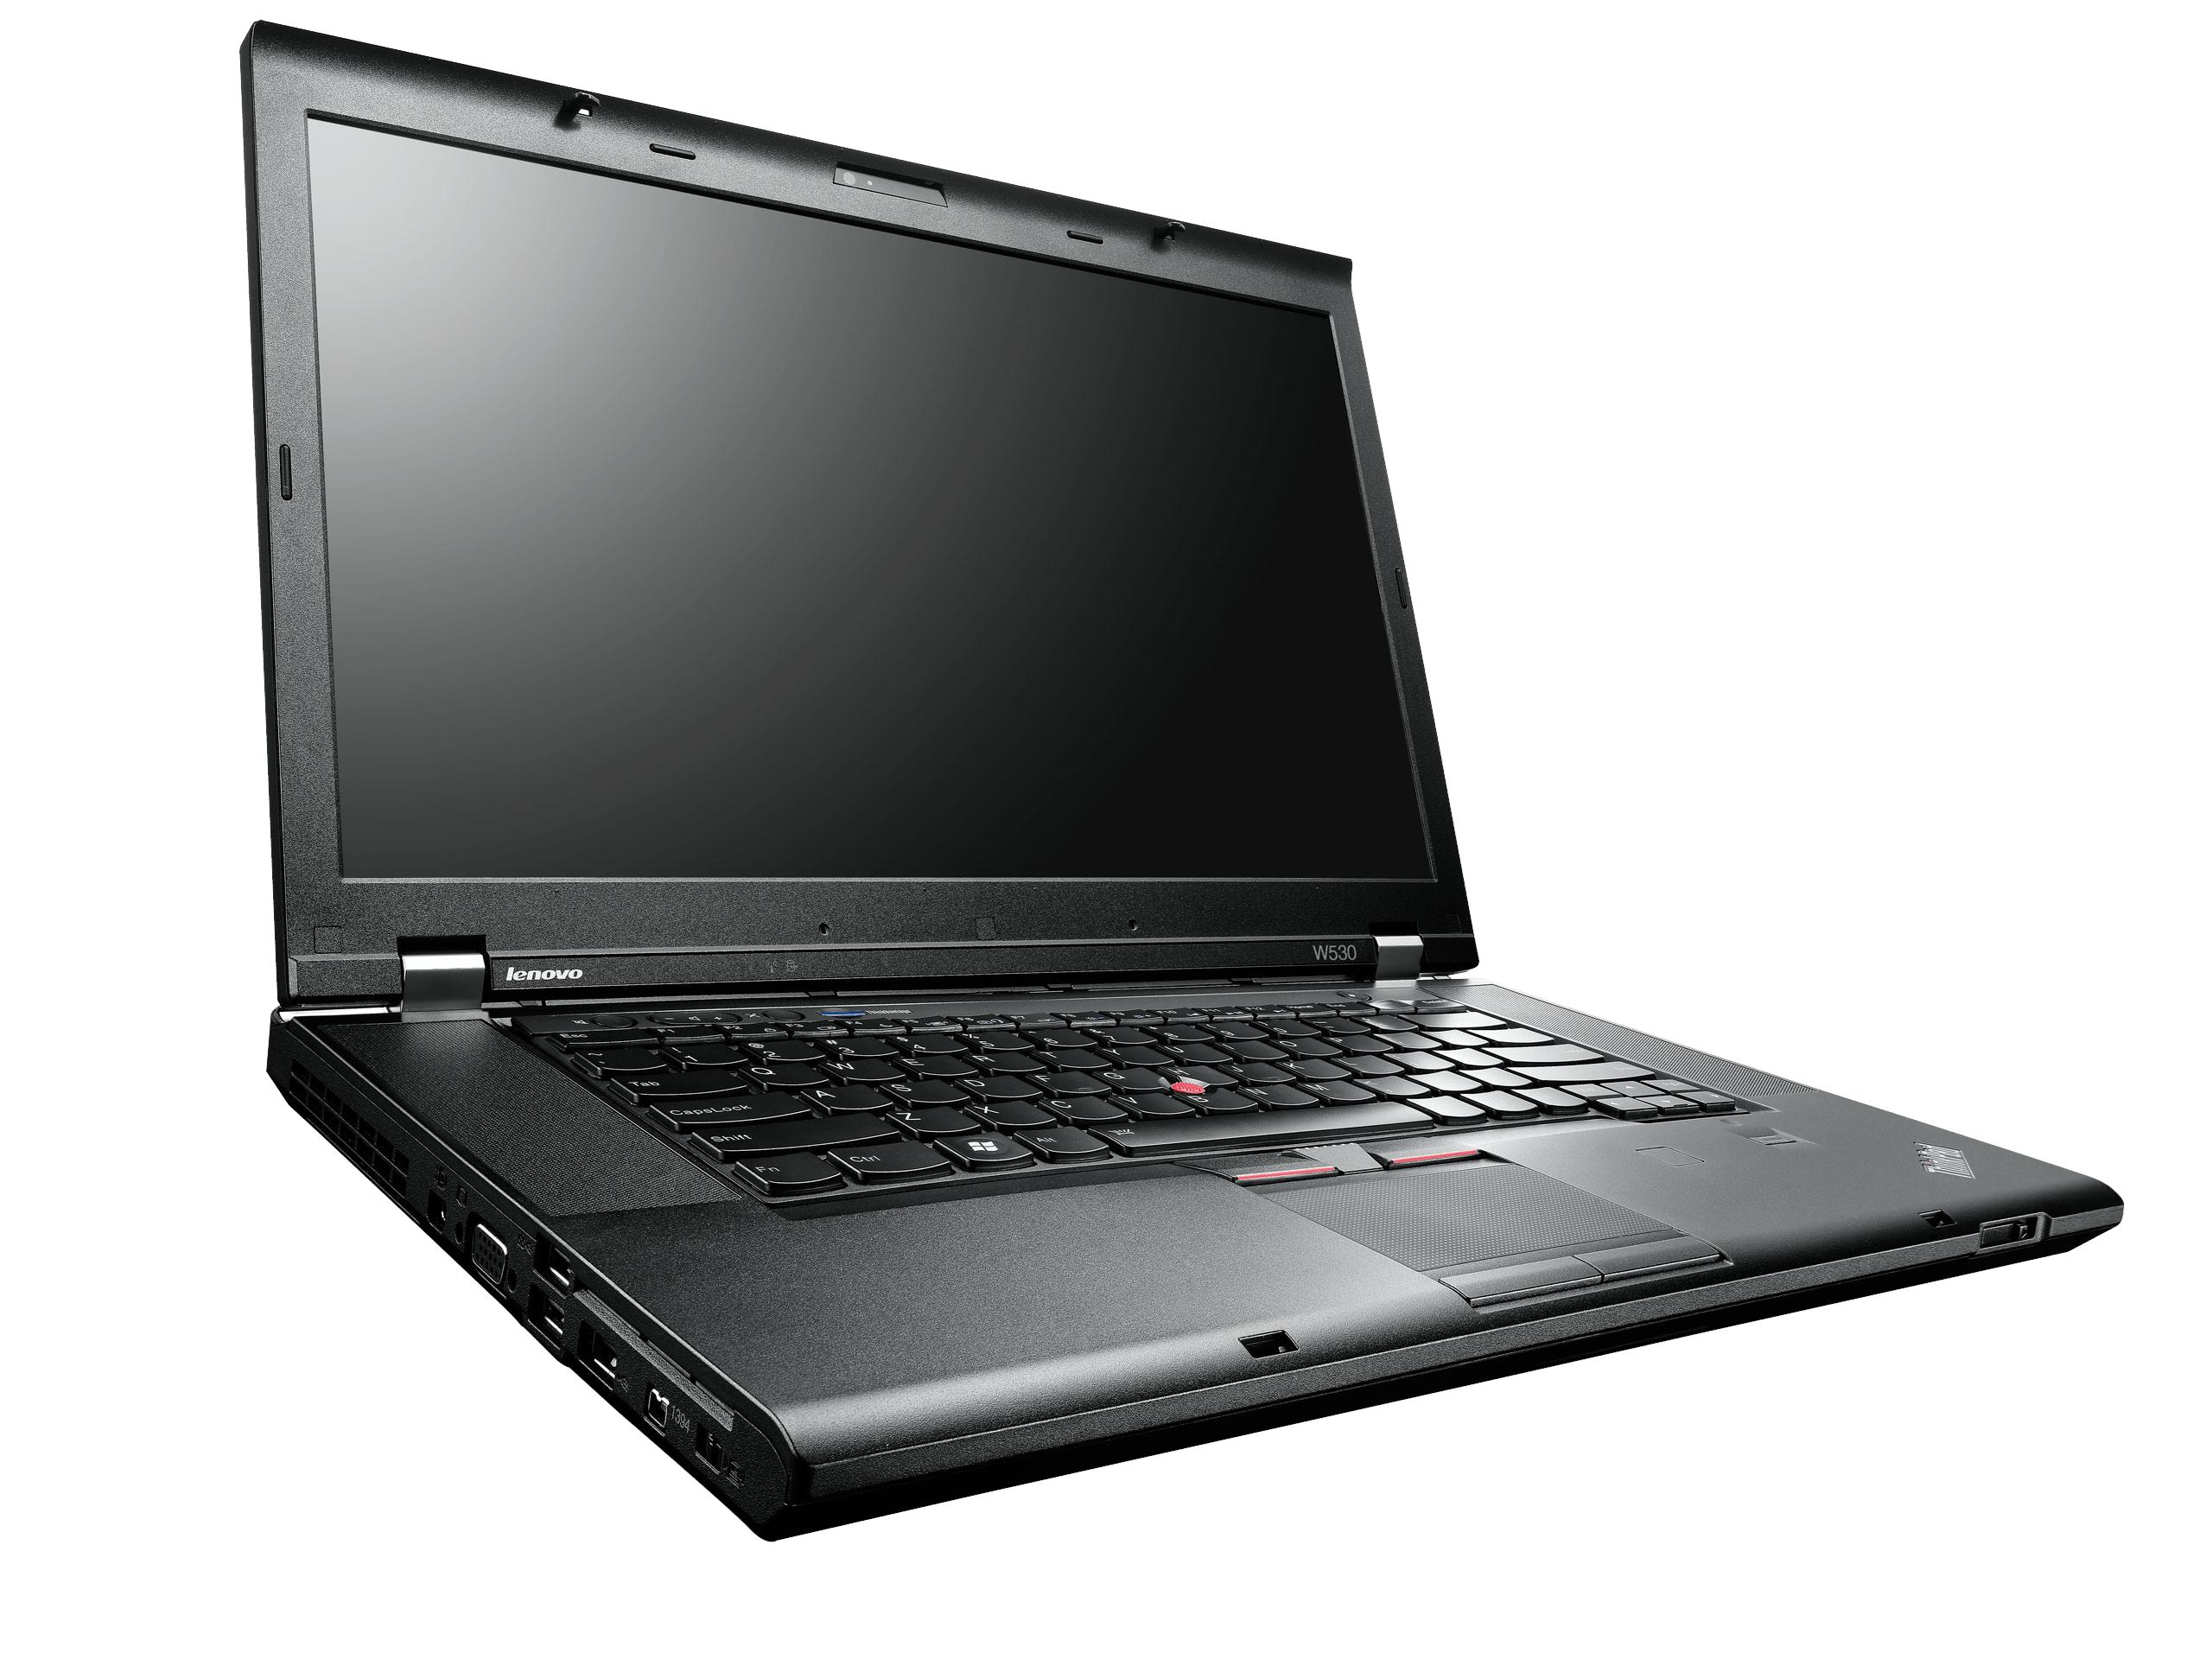 lenovo Lenovo thinkpad w530 på refurb